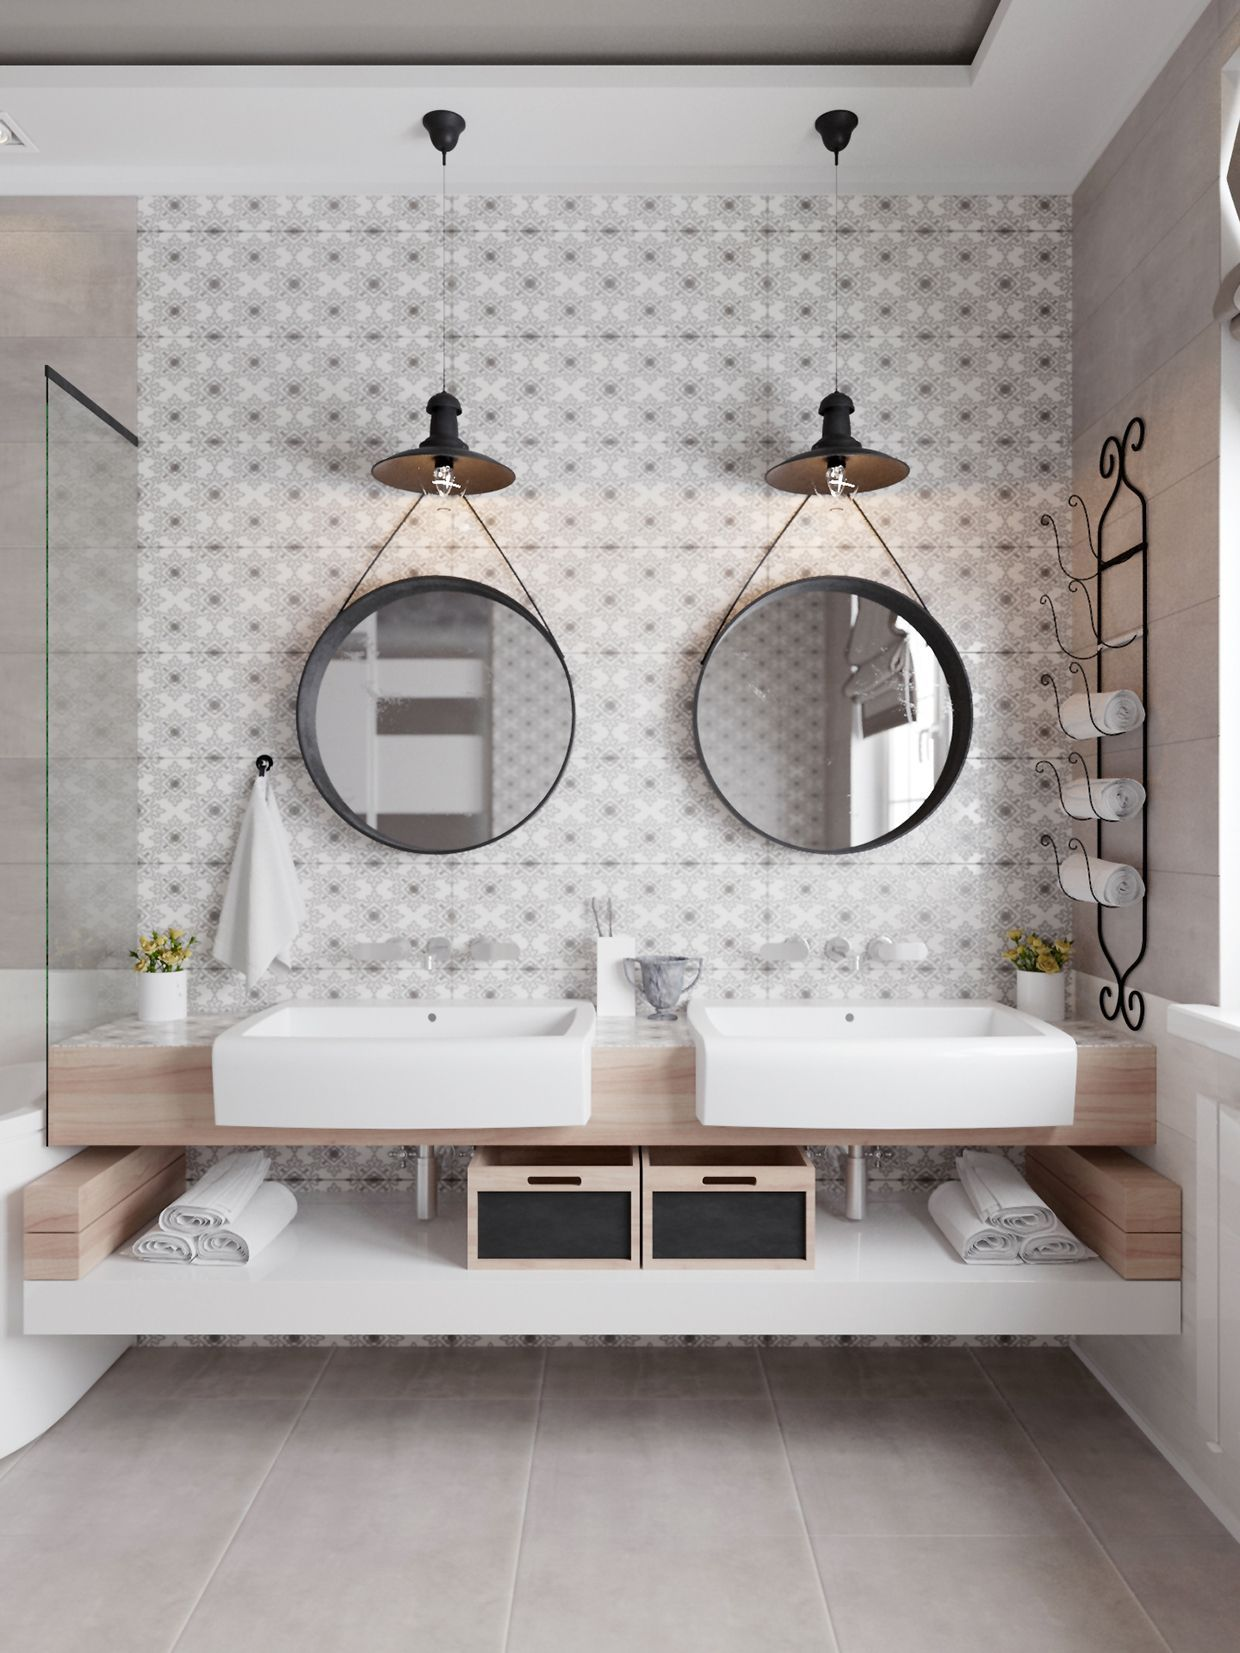 Картинки по запросу scandinavian style home bathroom | Design home ...